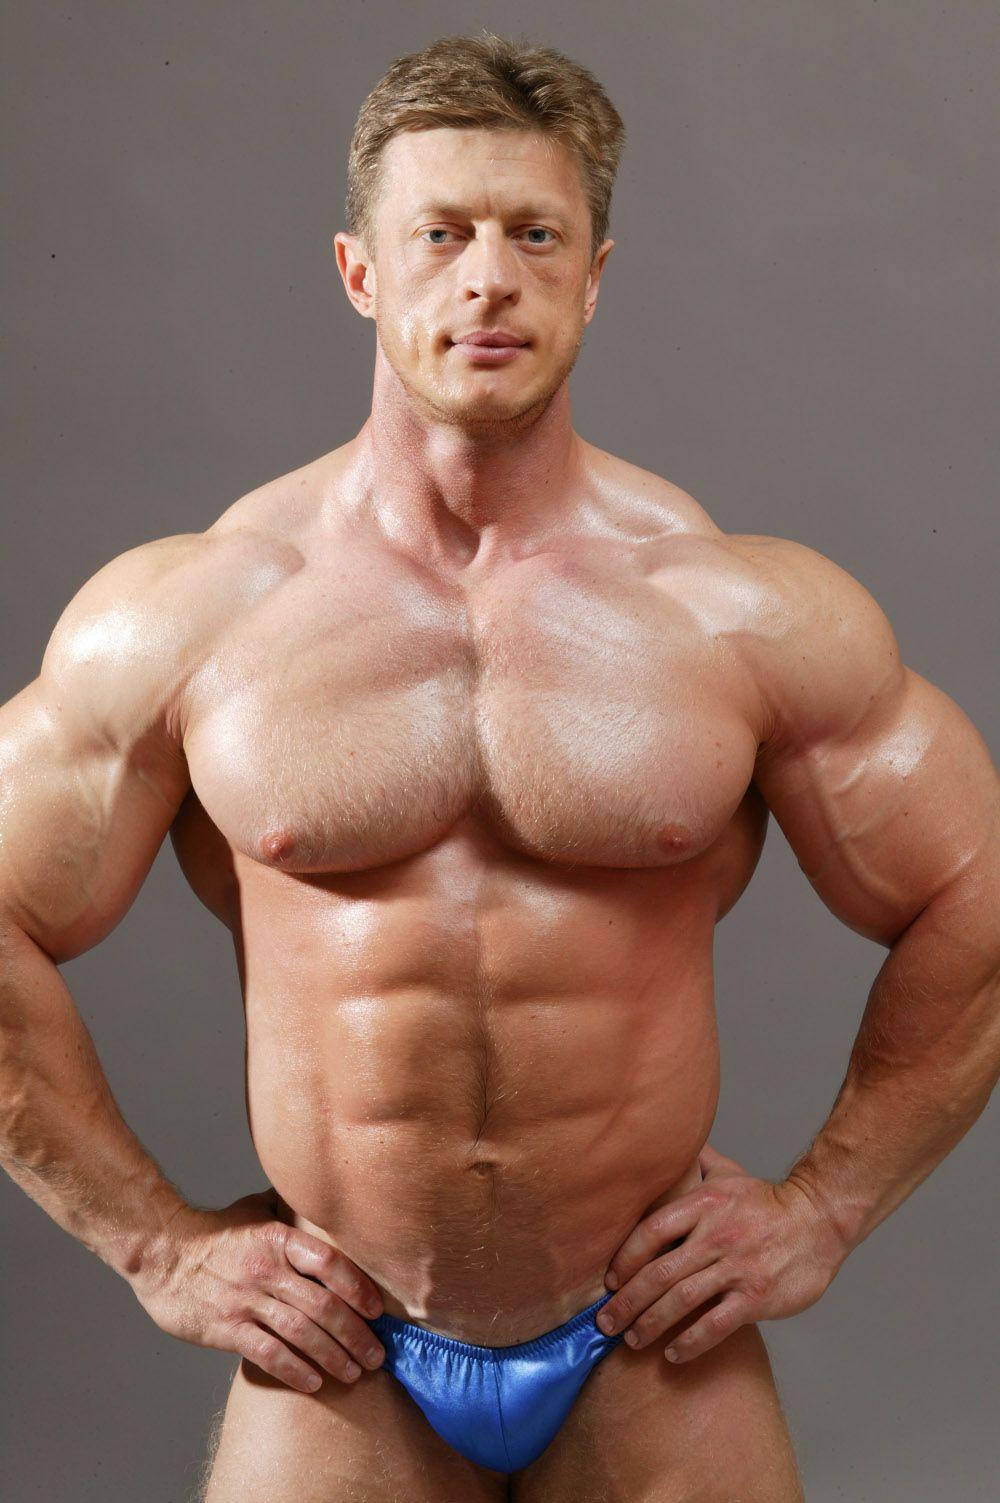 Muscle mens pics 26